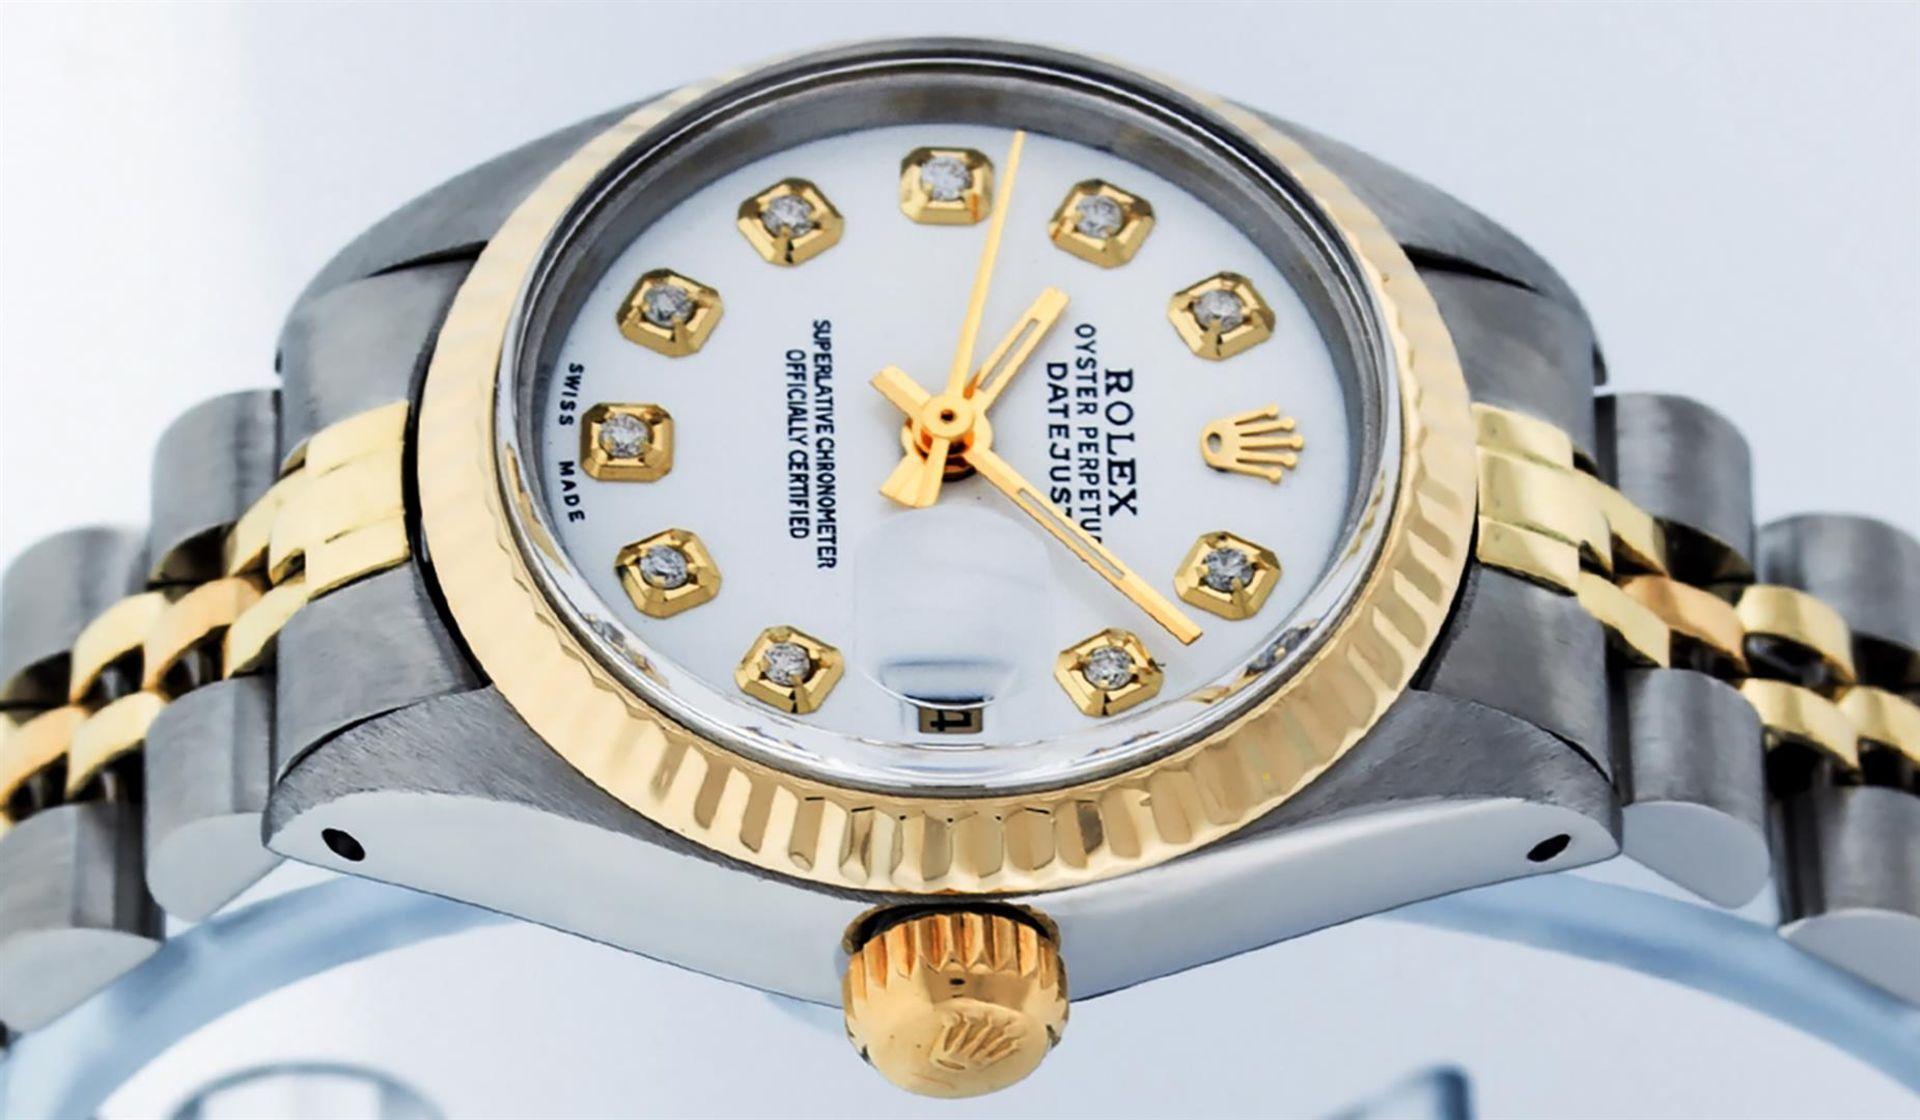 Rolex Ladies 2 Tone White Diamond 26MM Datejust Wristwatch - Image 6 of 8